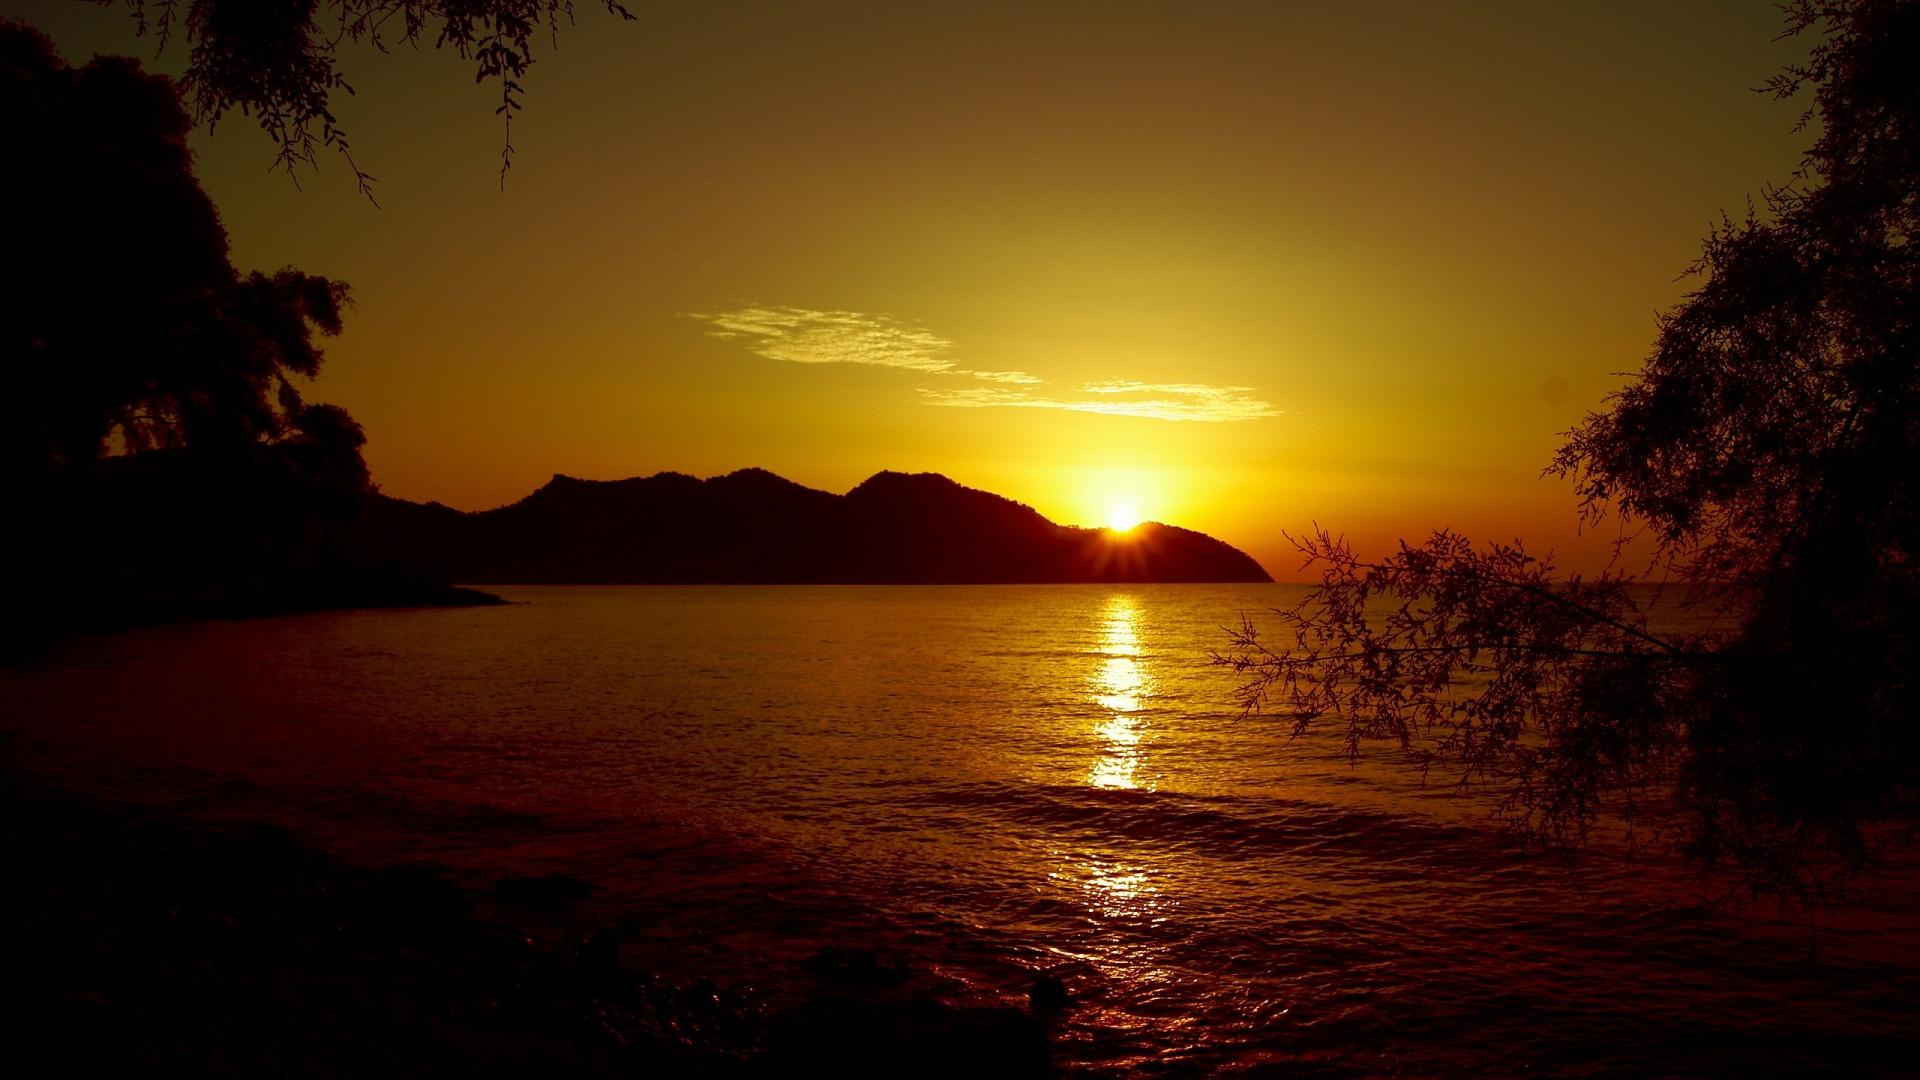 Sunset cala bona